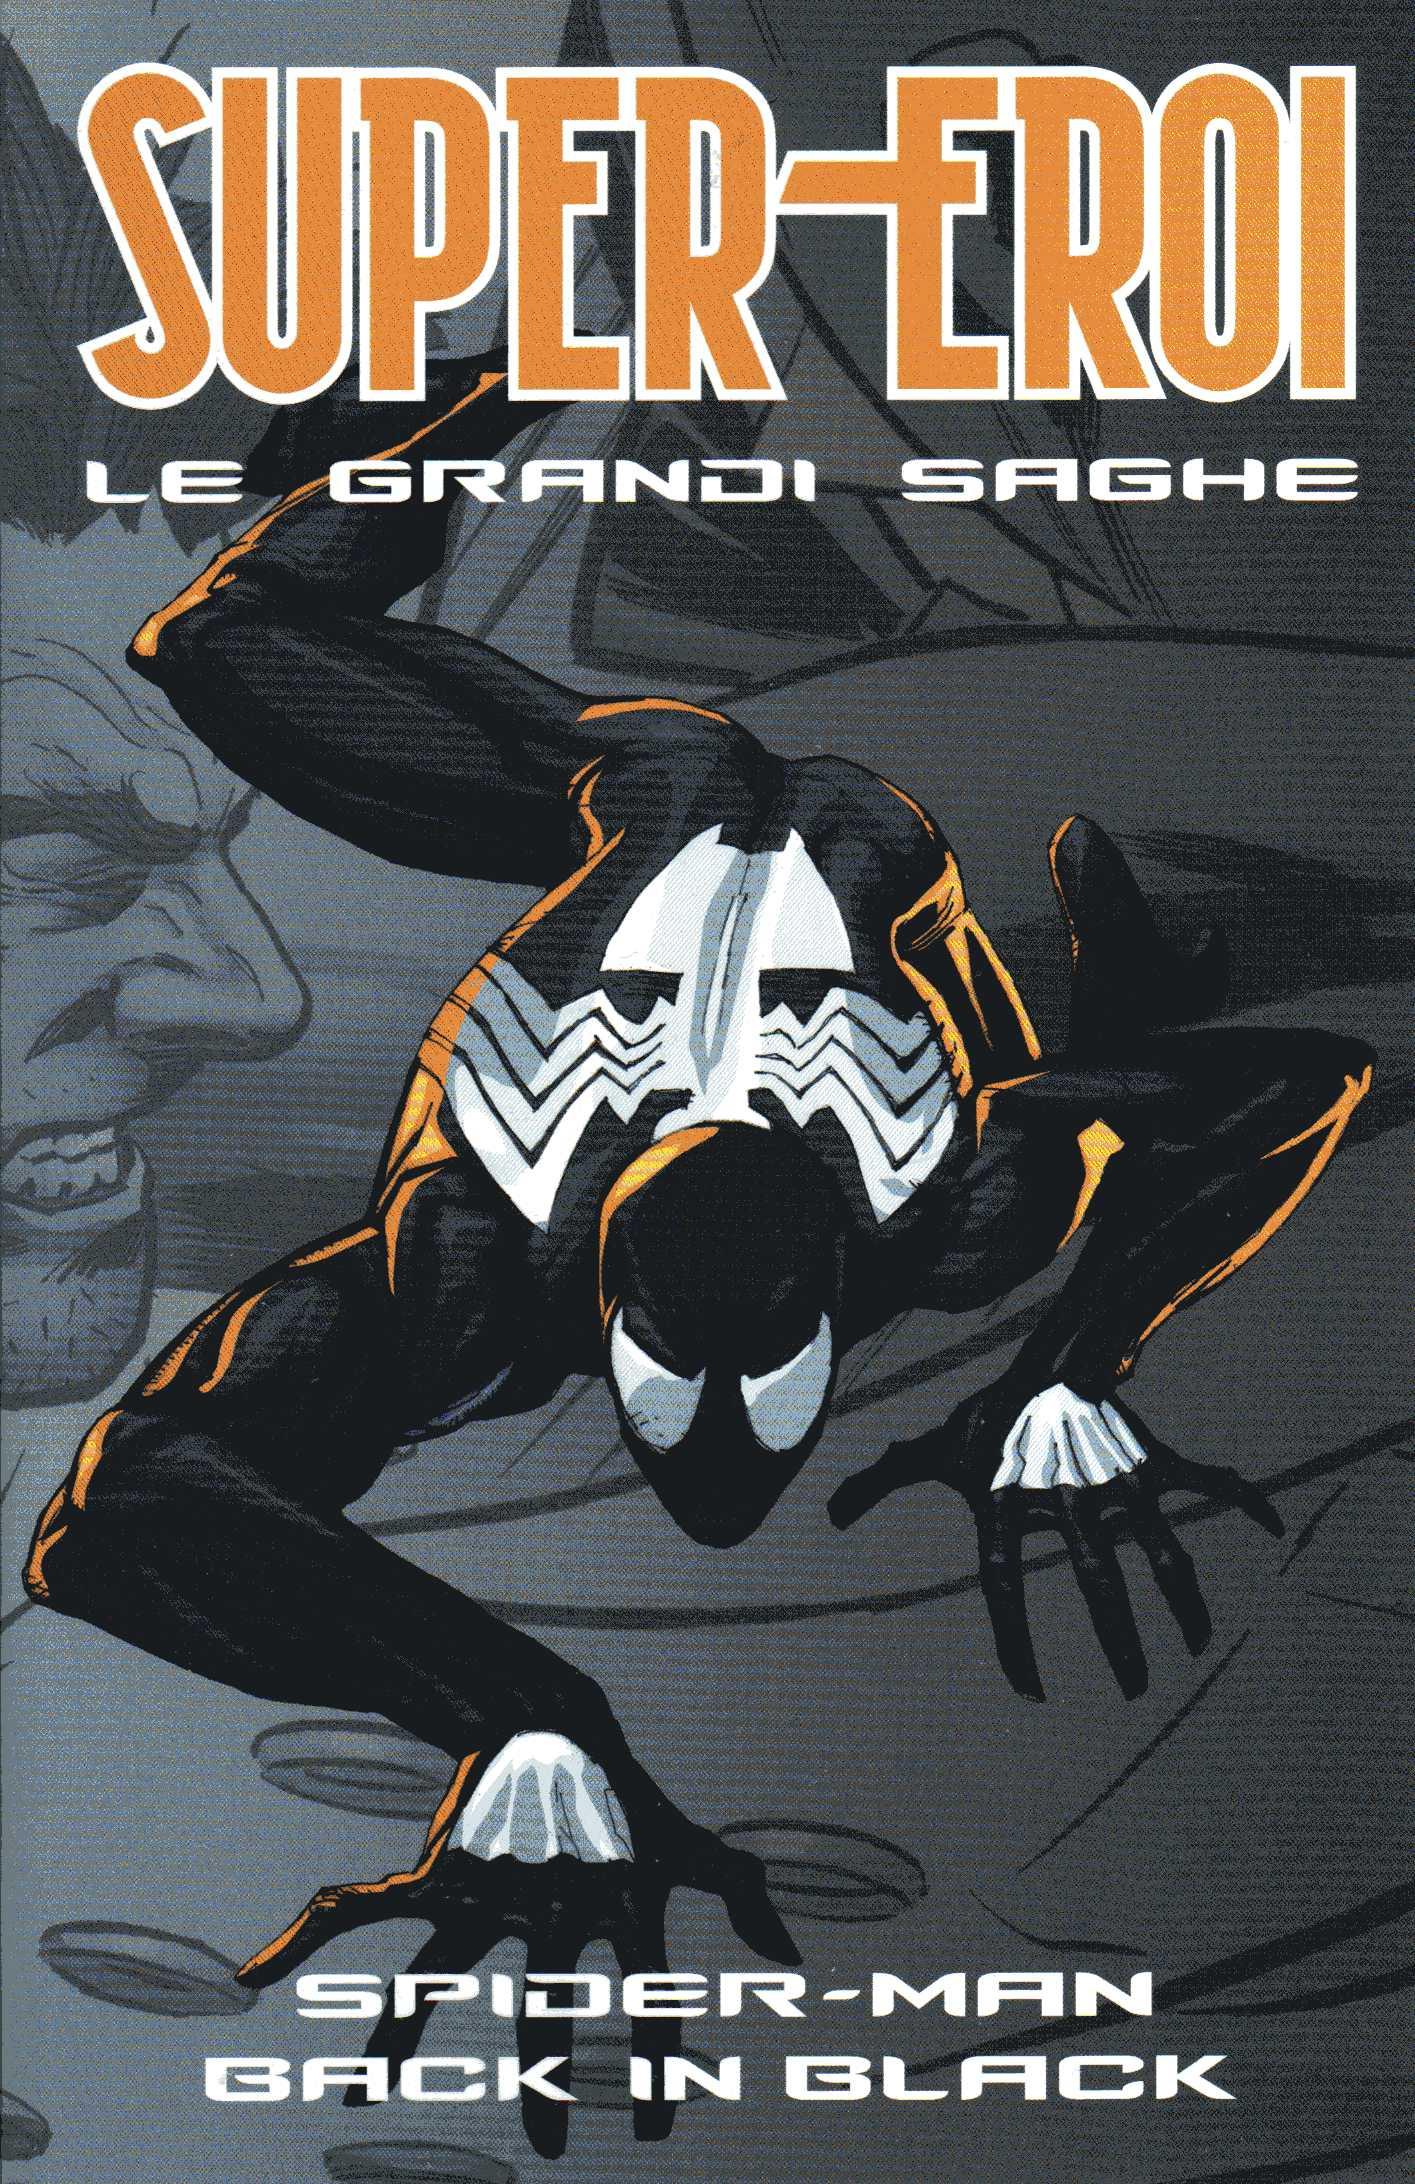 Supereroi - Le grandi saghe vol. 03